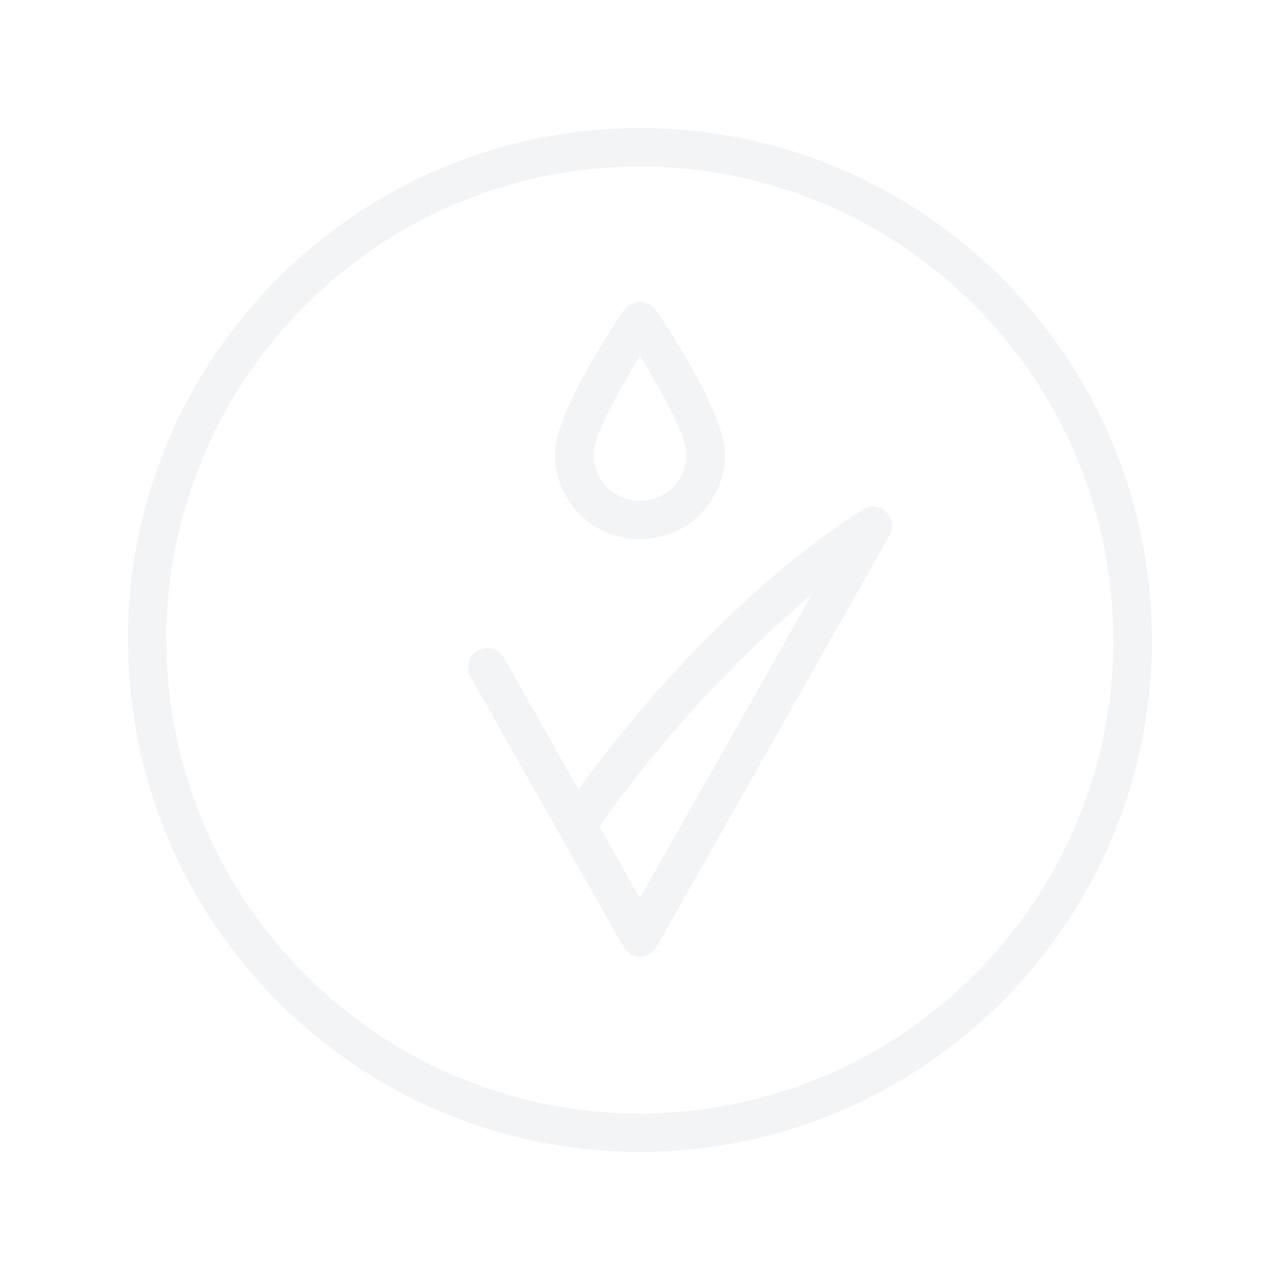 WELLA PROFESSIONALS Fusion Shampoo 50ml